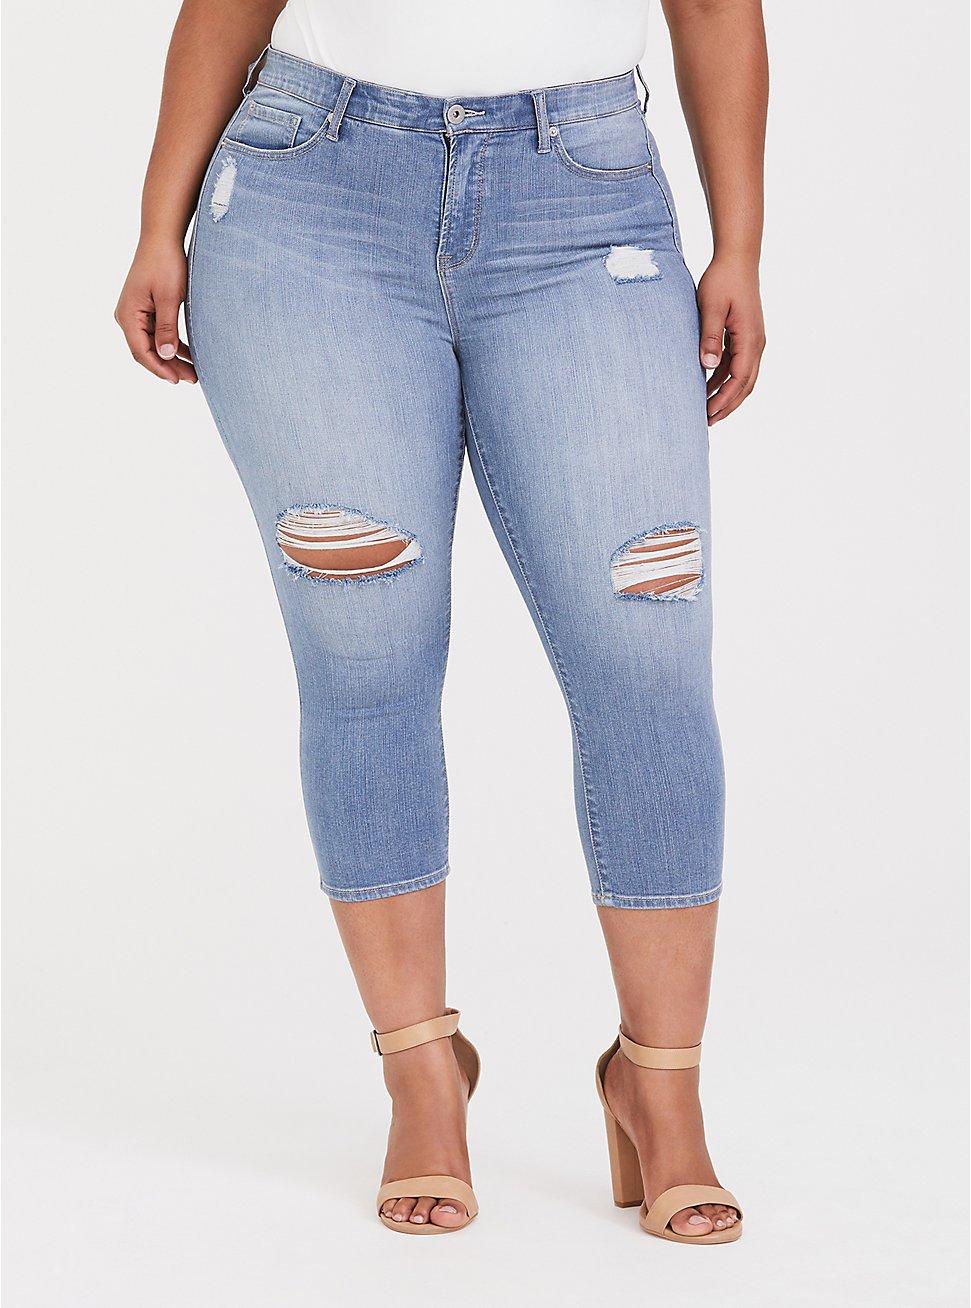 Crop Sky High Skinny Jean - Premium Stretch Light Wash, JET STREAM, hi-res